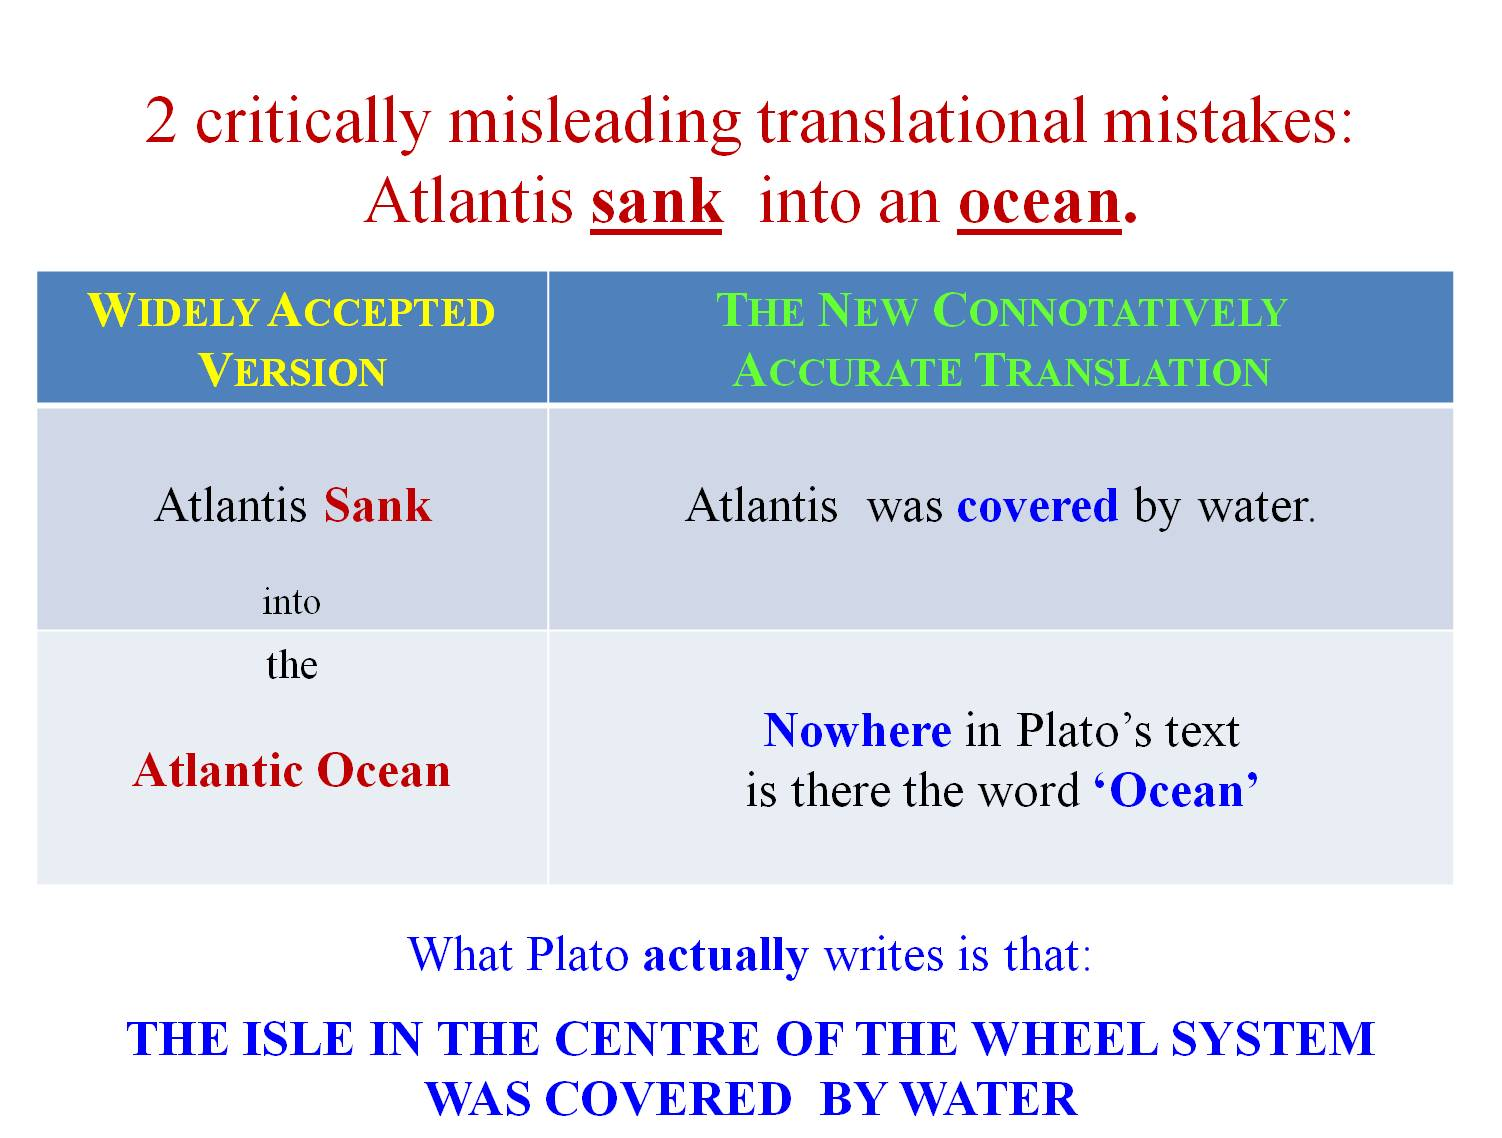 SRANK-OCEAN-2-serious-mistakes